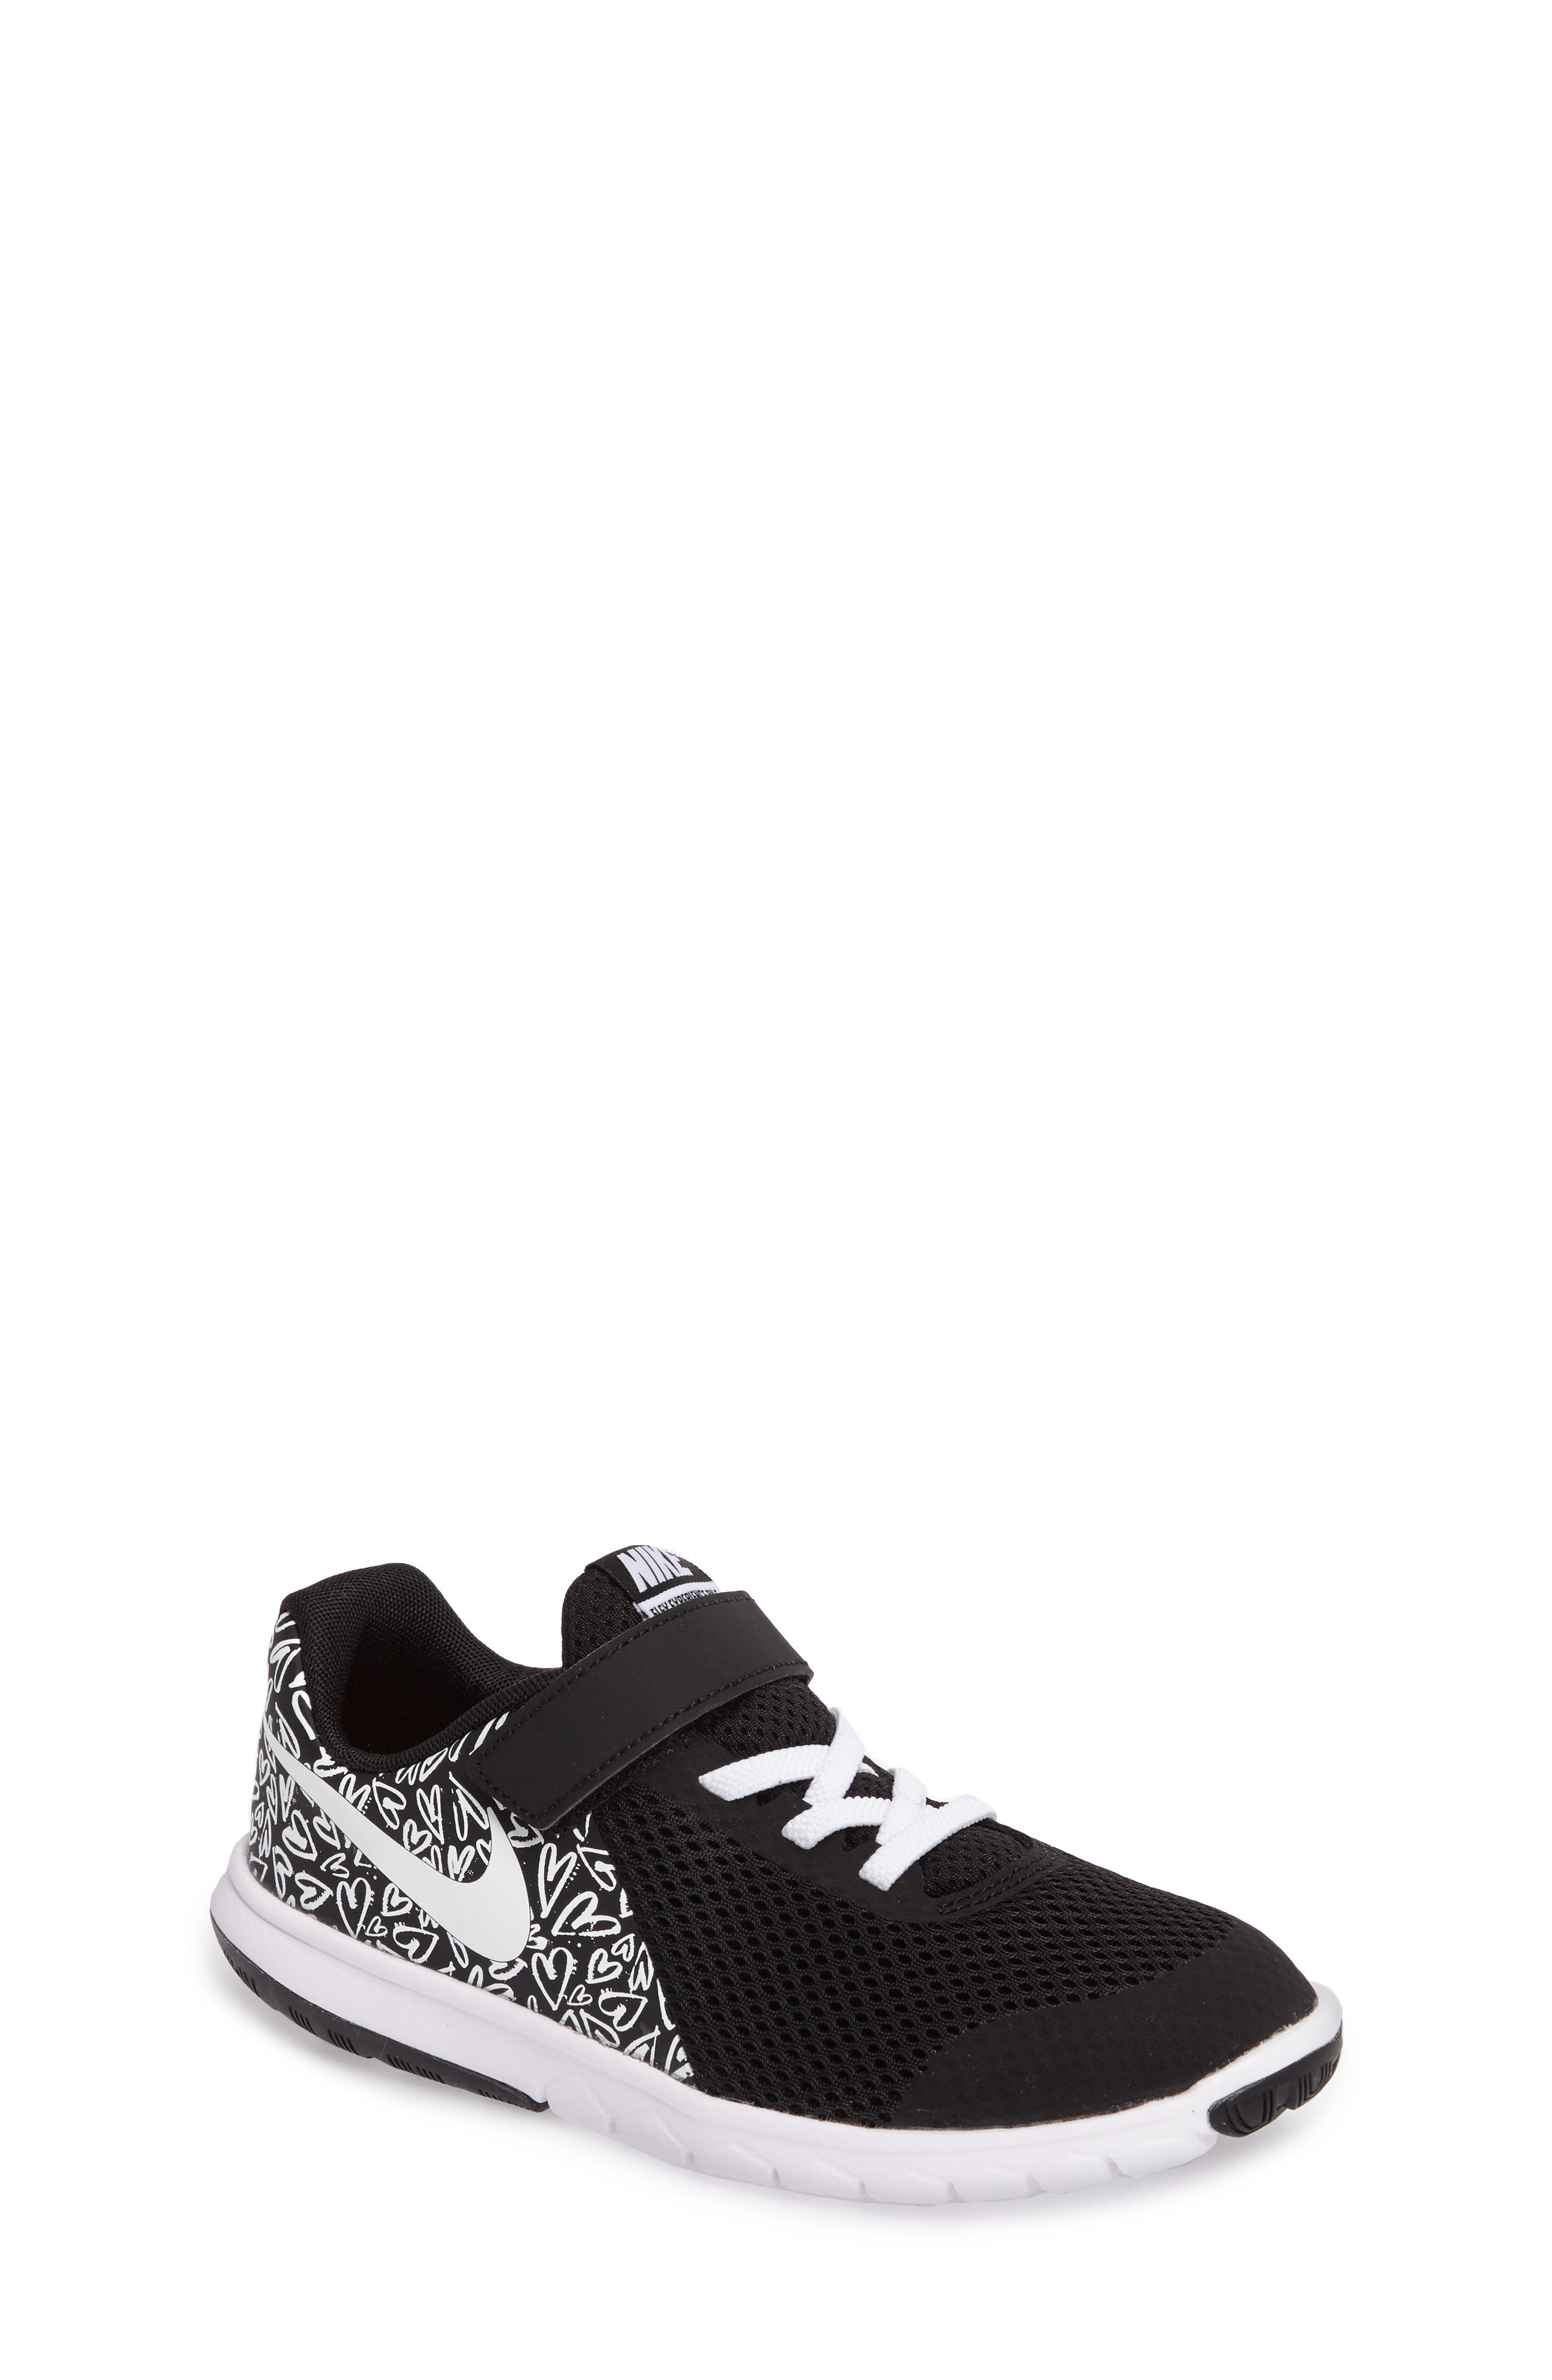 Main Image - Nike 'Flex Experience 5' Running Shoe (Toddler & Little Kid)